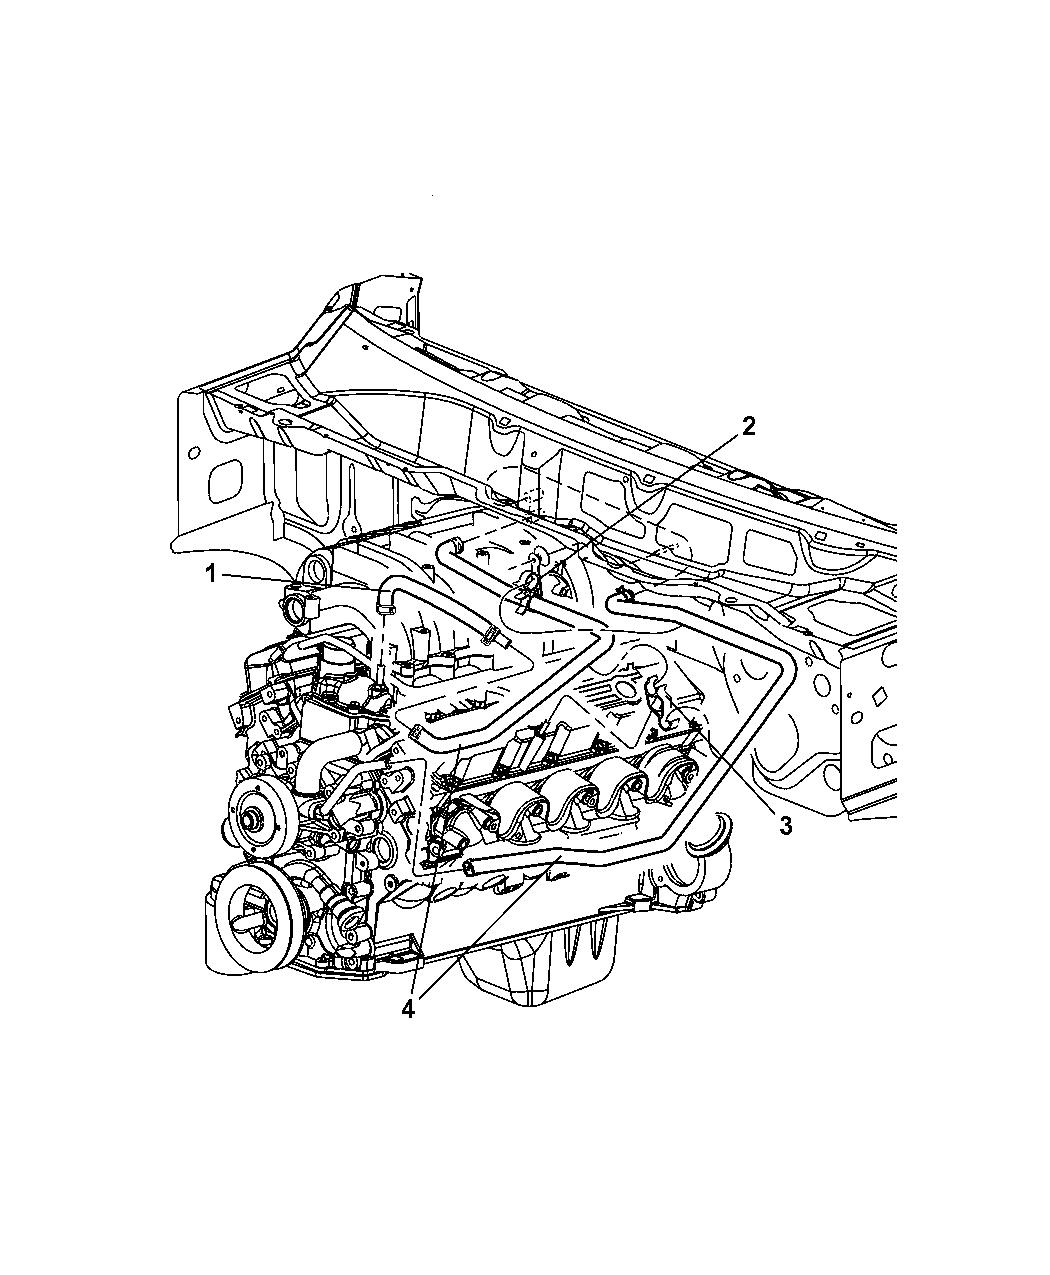 American Shifter 108308 Black Shift Knob with M16 x 1.5 Insert Blue 5 Speed Shift Pattern - 5DR-RDL